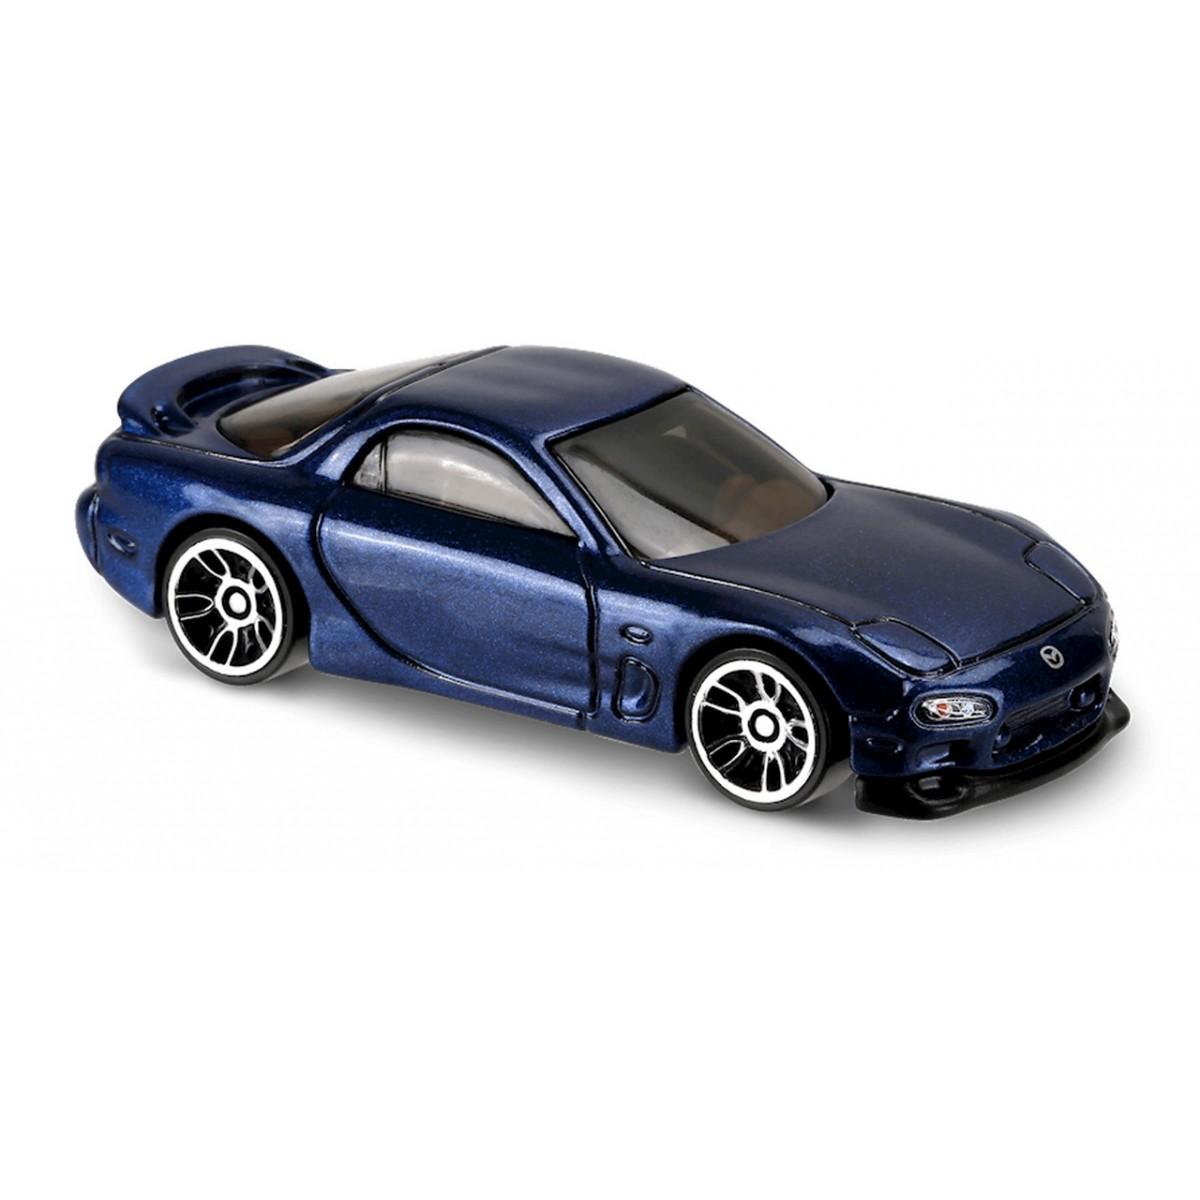 Carrinho Hot Wheels: '95 Mazda RX-7 Azul